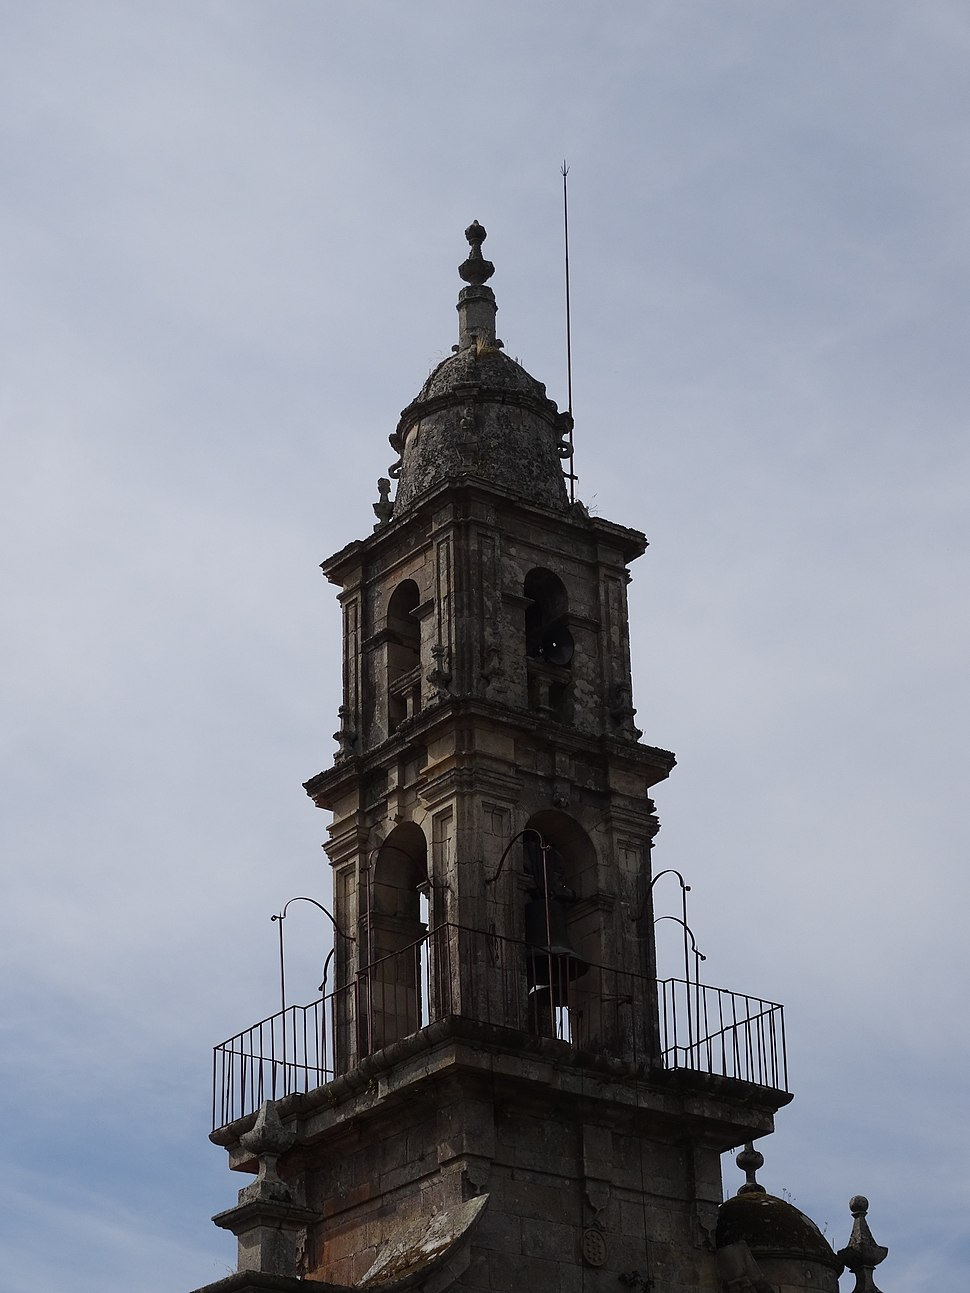 Campanario igrexa Grixoa, San Amaro